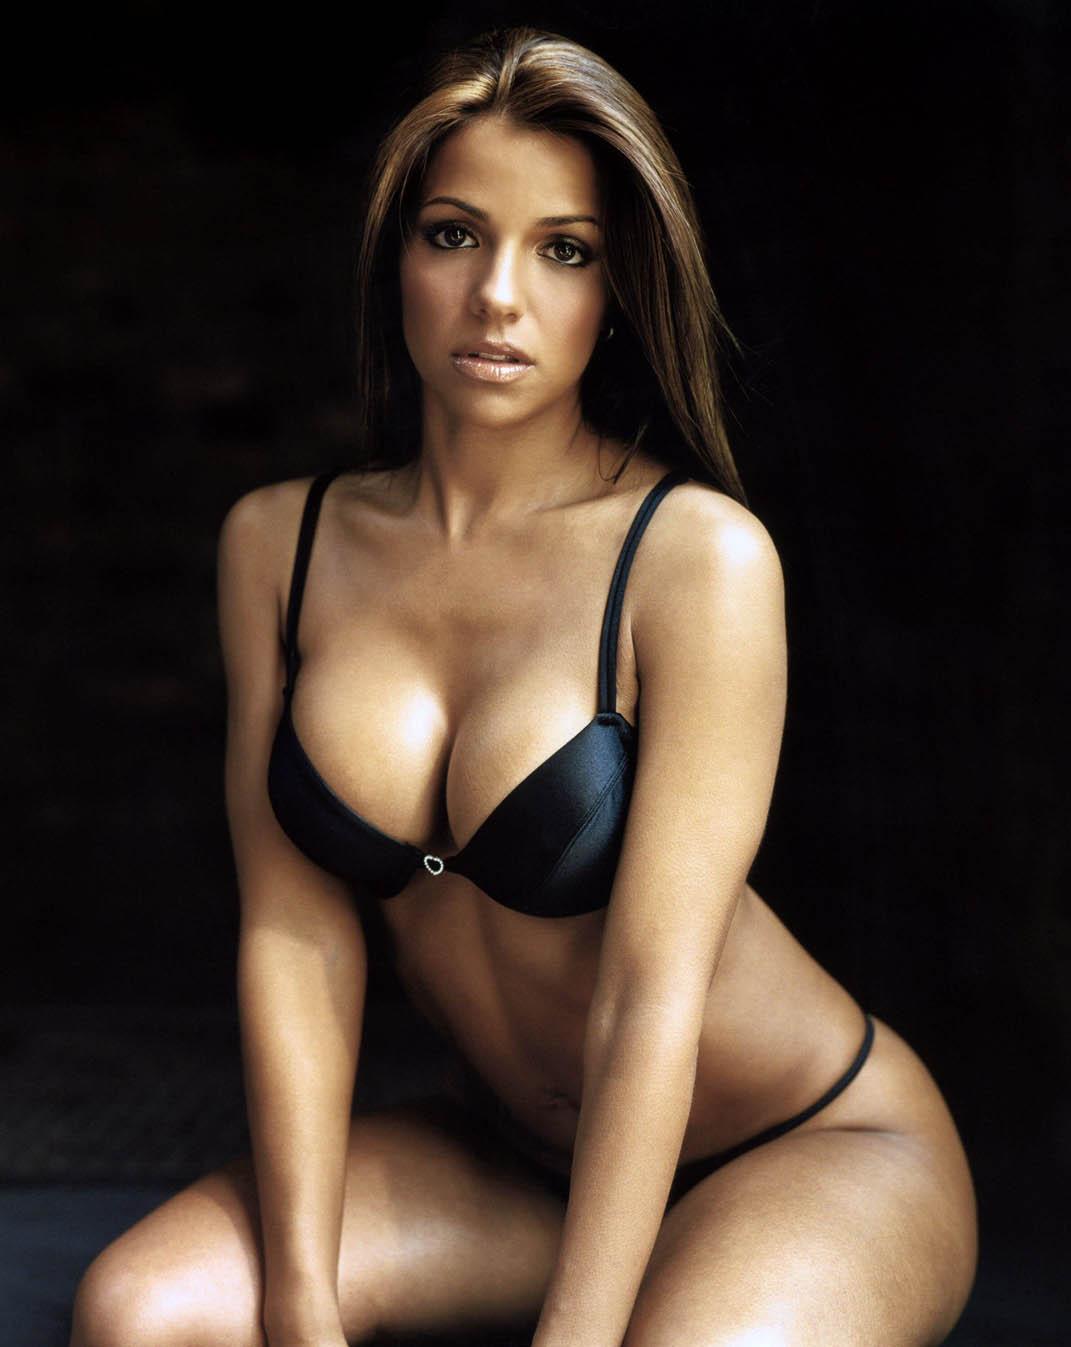 Vida Guerra Hollywood Hot And Sexy Actress Photos -4351